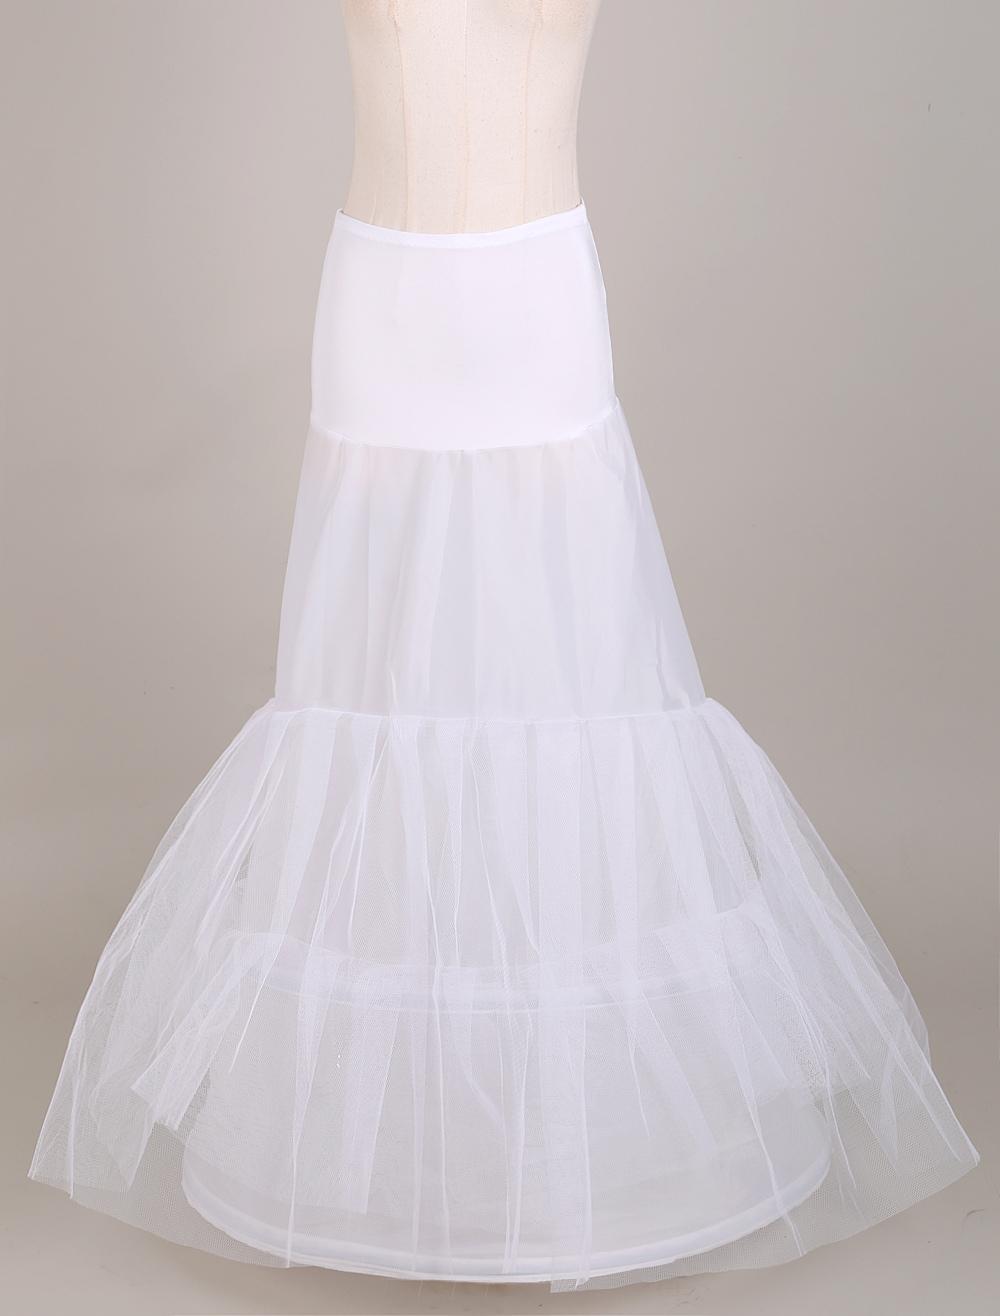 Trumpet Style Bridal Slip with Elastic Waist